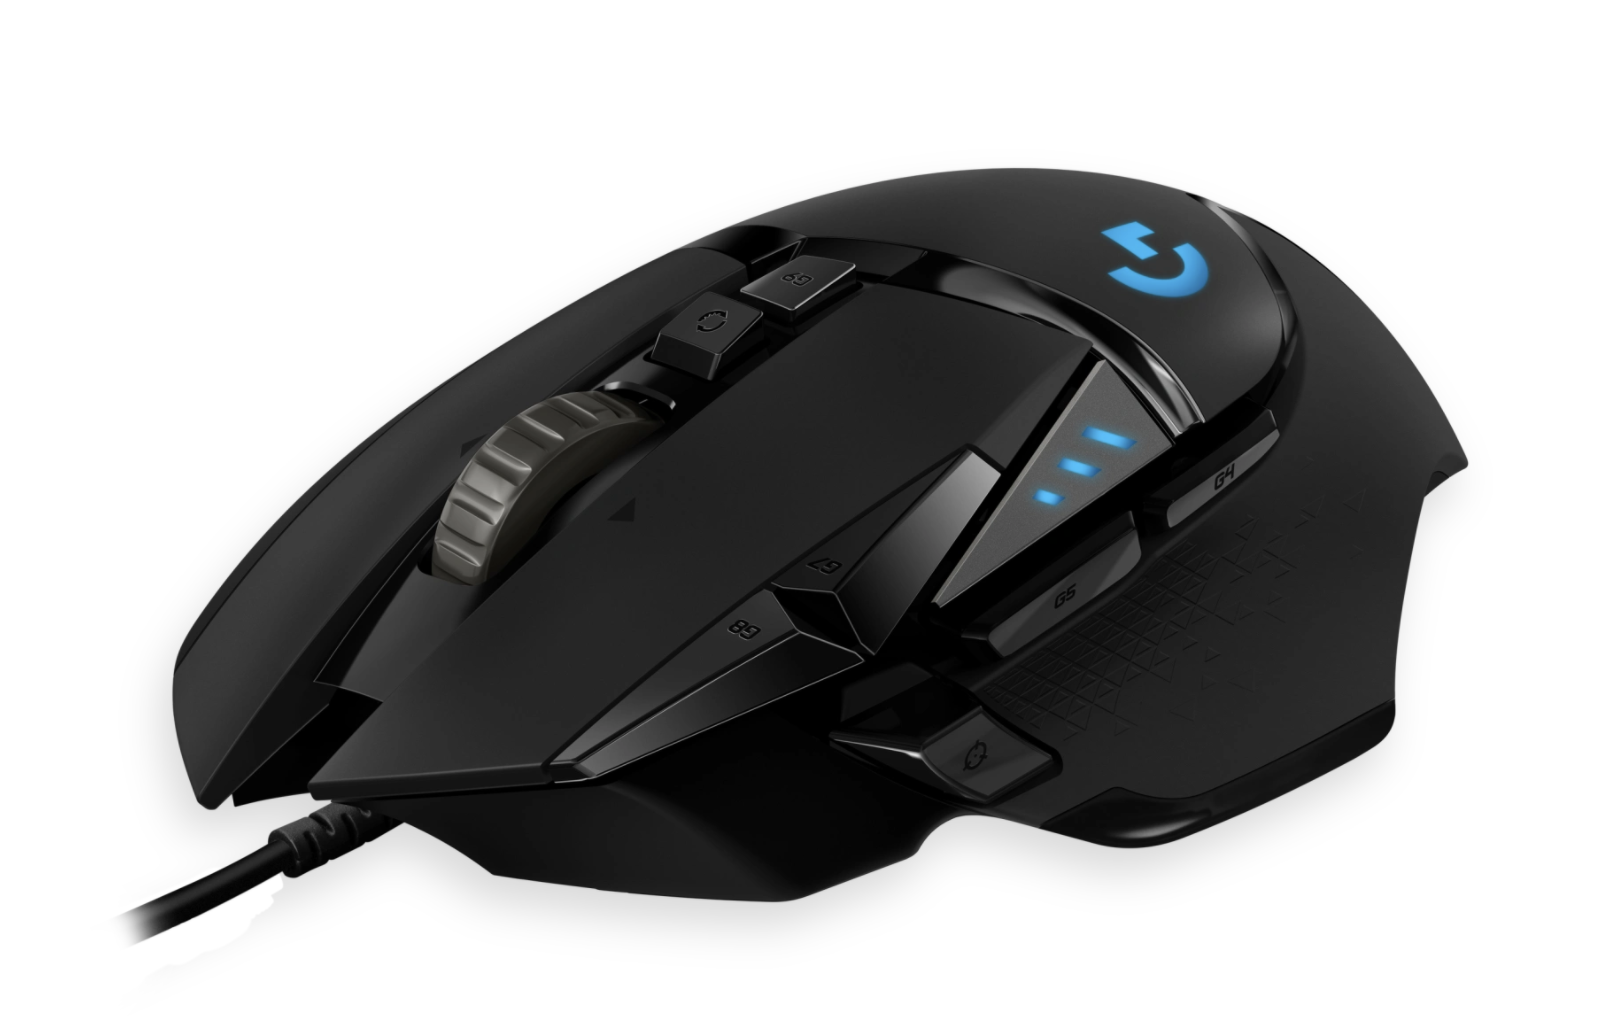 Logitech G502 Lightspeed Gaming Mouse